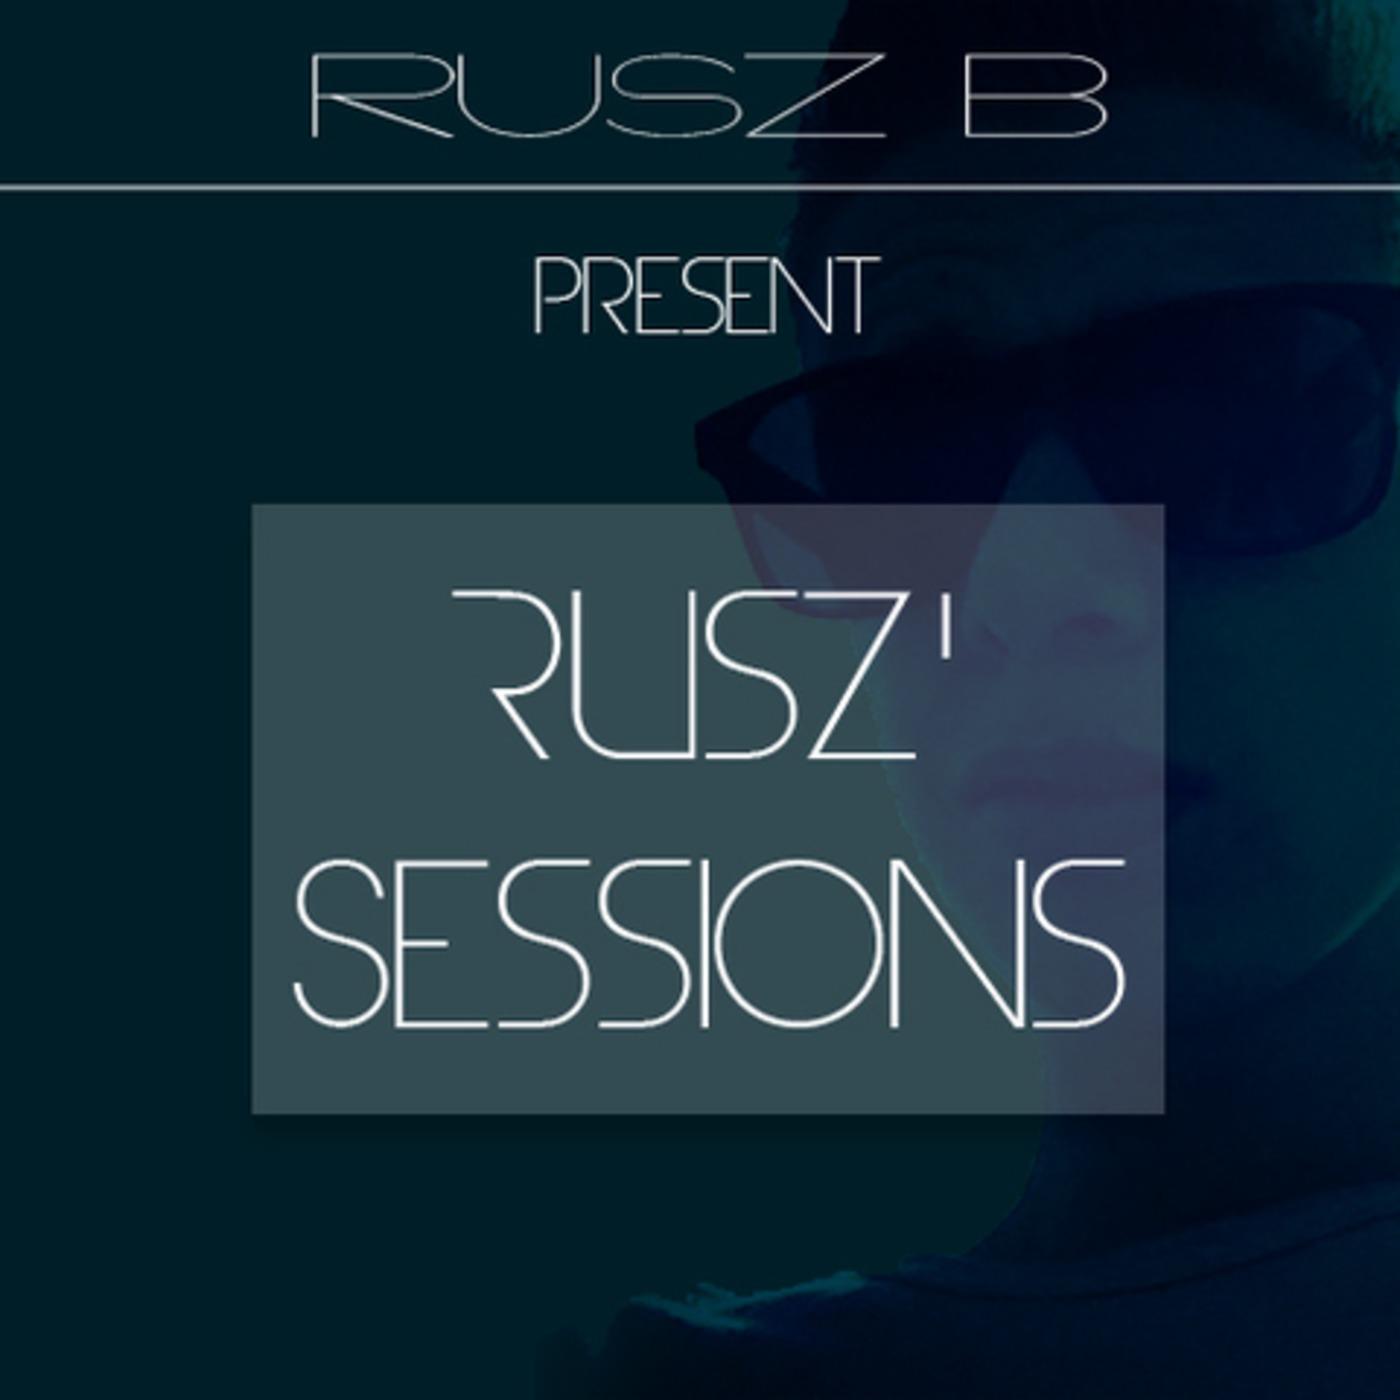 RUSZ B's Podcast